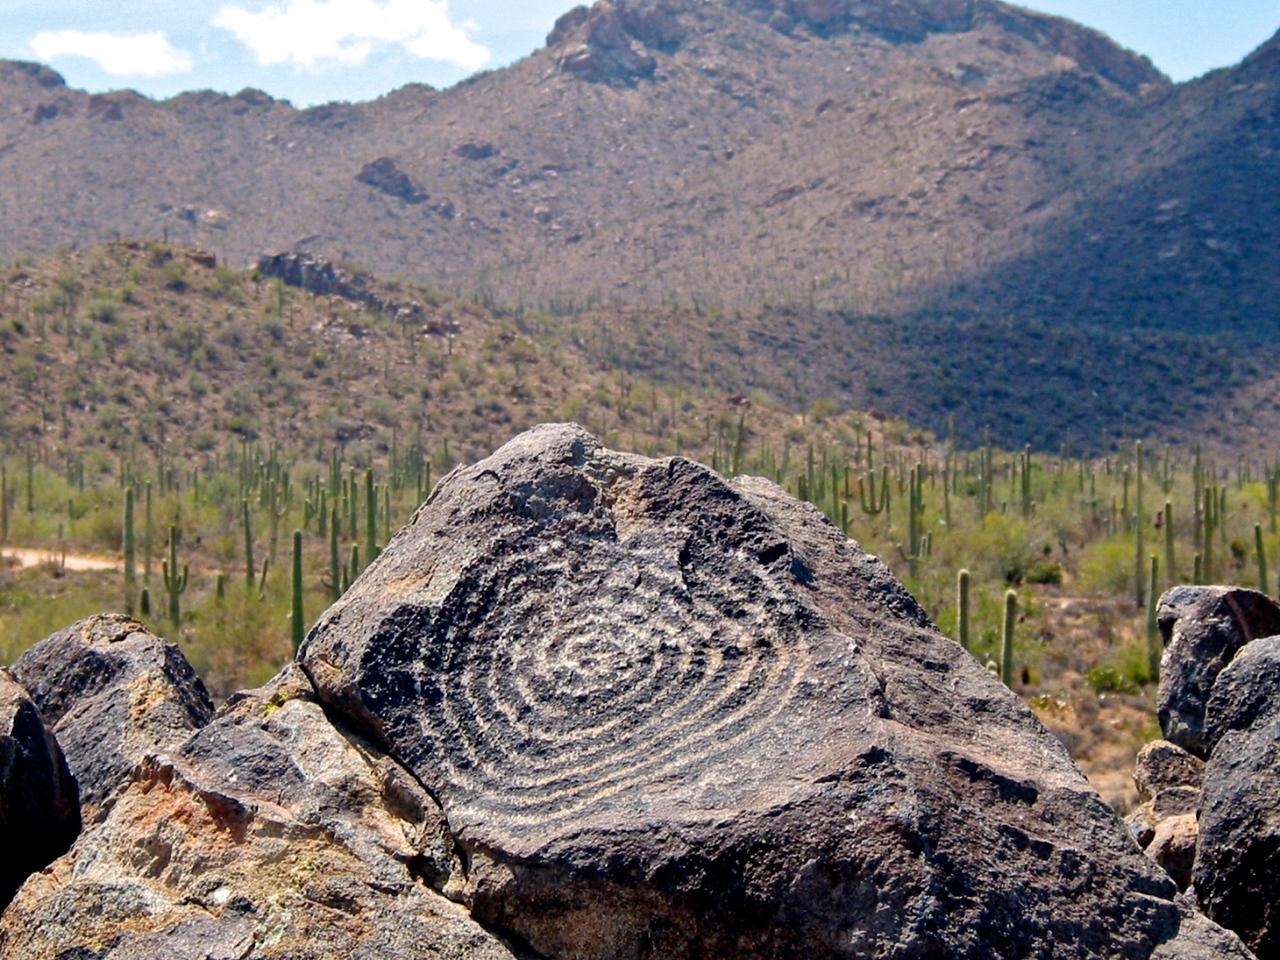 These petroglyphs can be seen near Signal Hill in Saguaro Naitonal Park near Tucson.